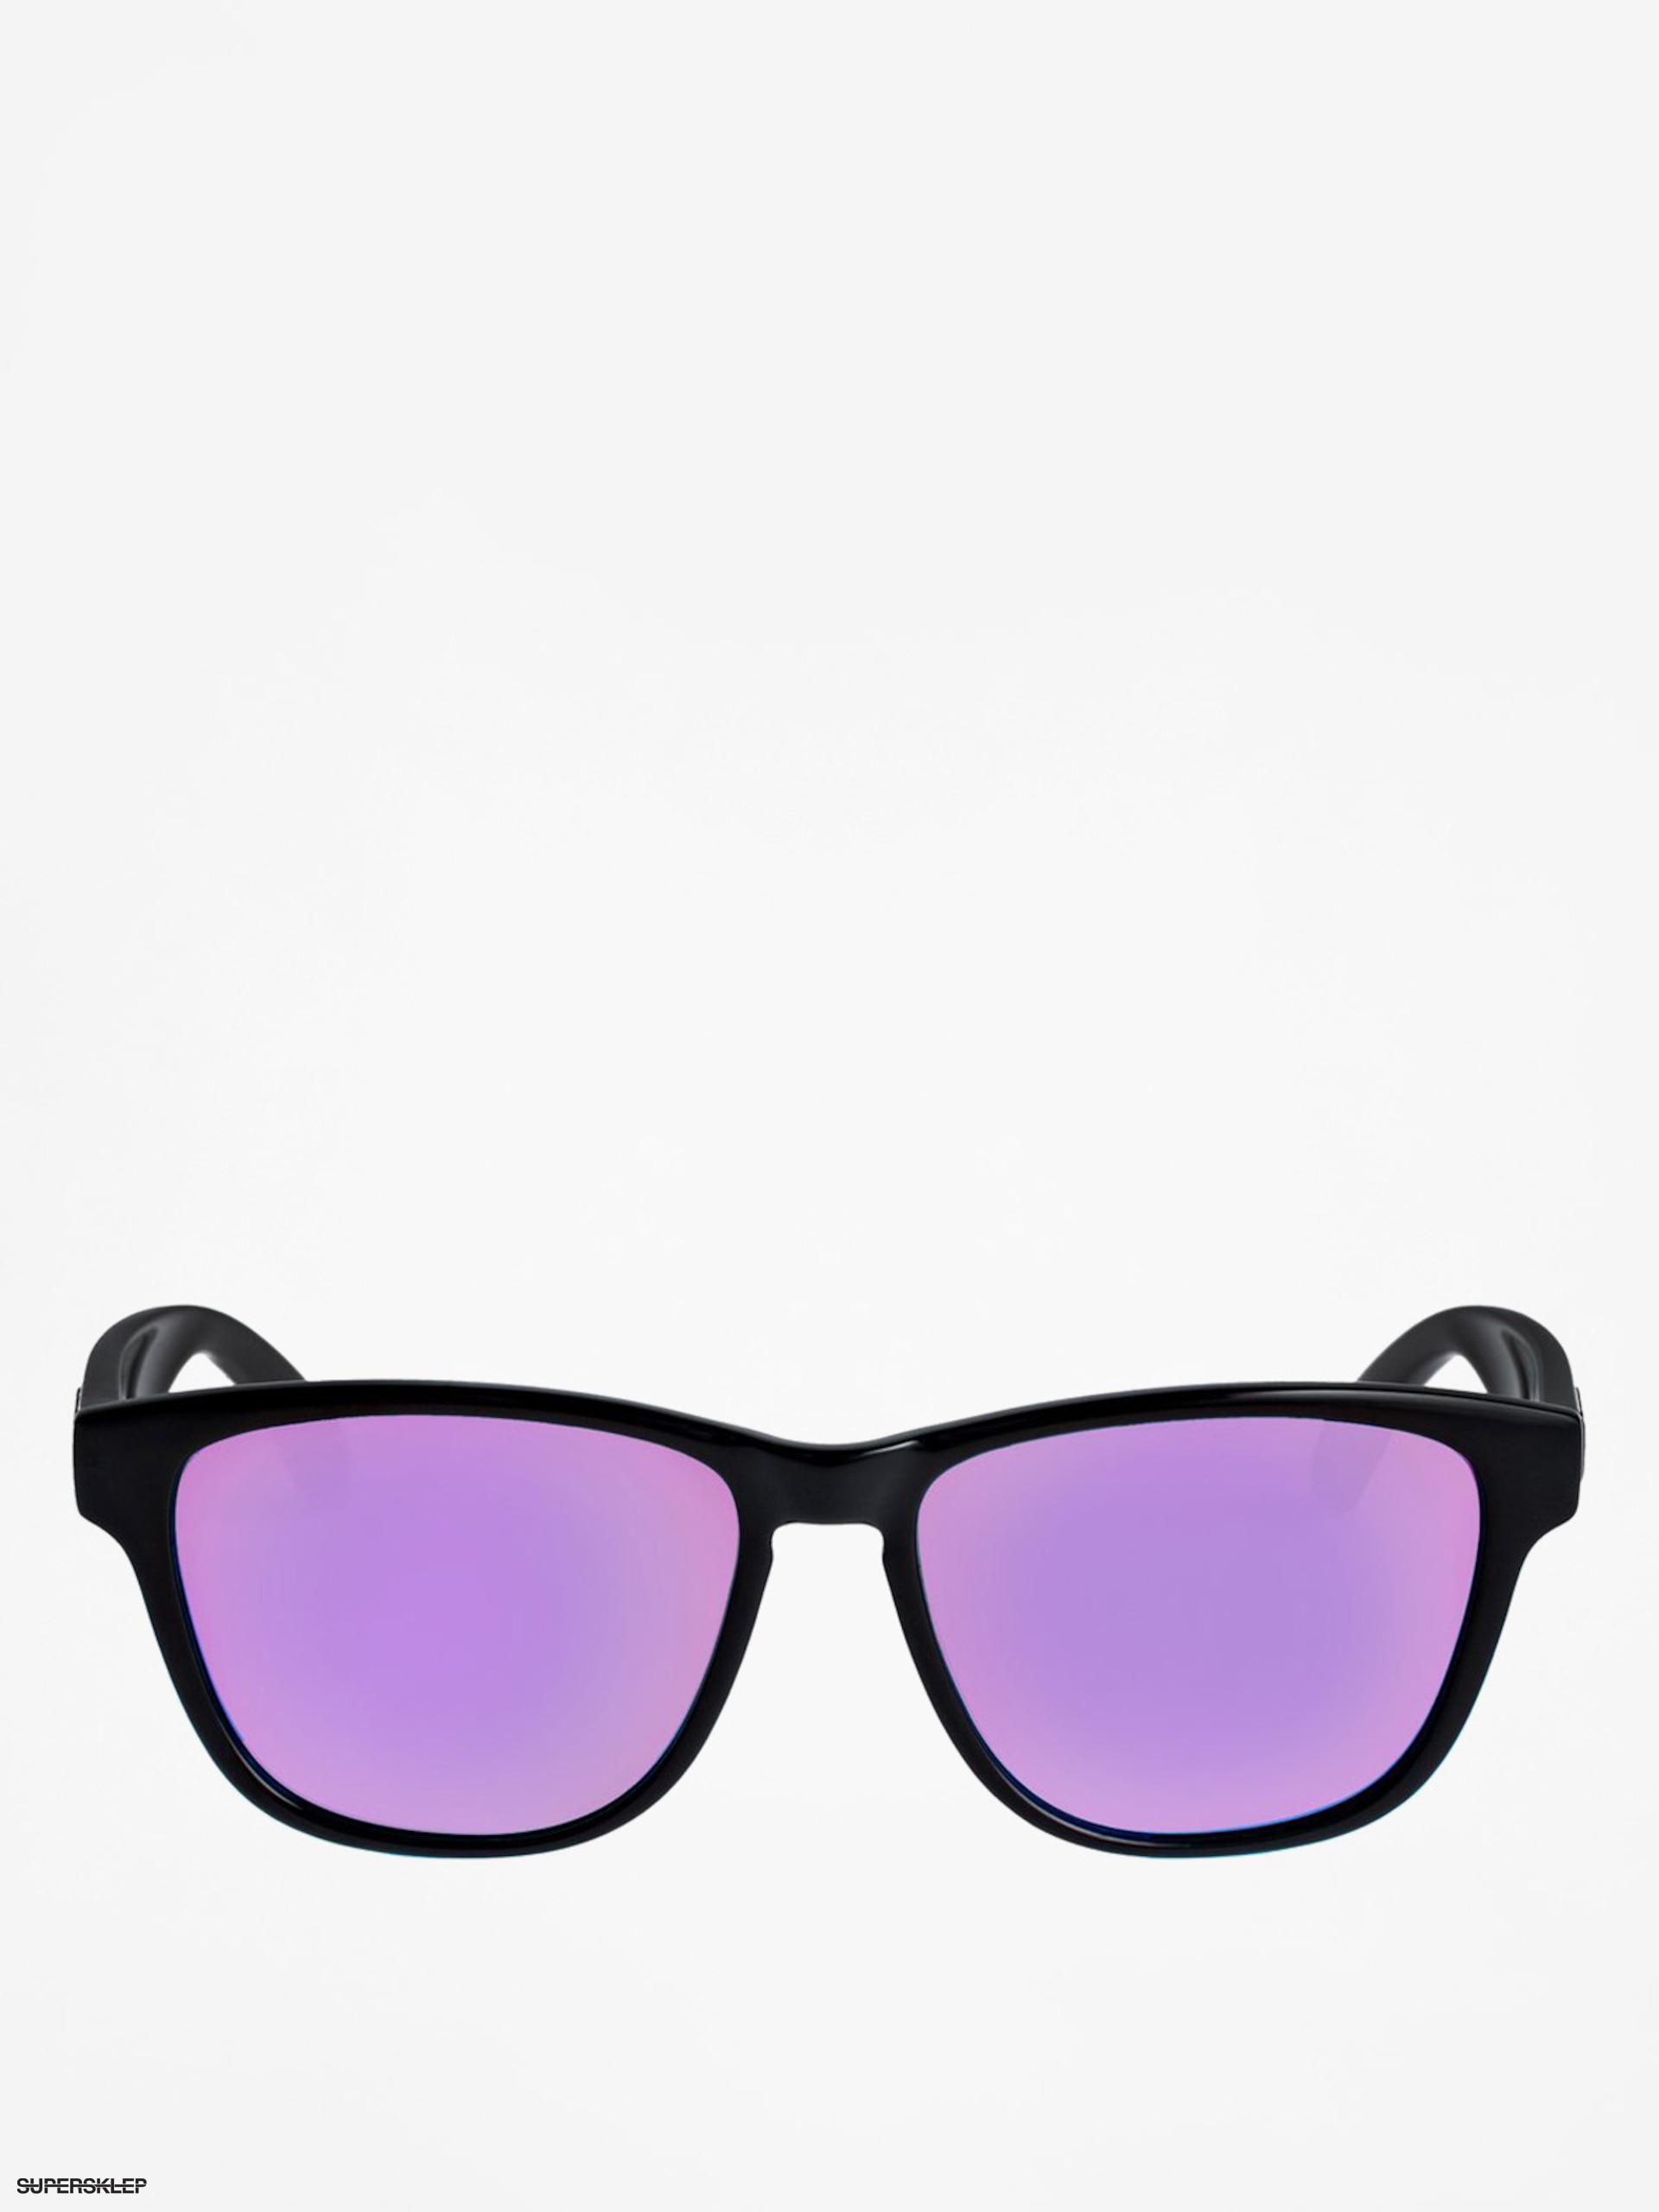 919e3a228 Slnečné okuliare Roxy Mini Uma Wmn (shiny black/ml purpl)